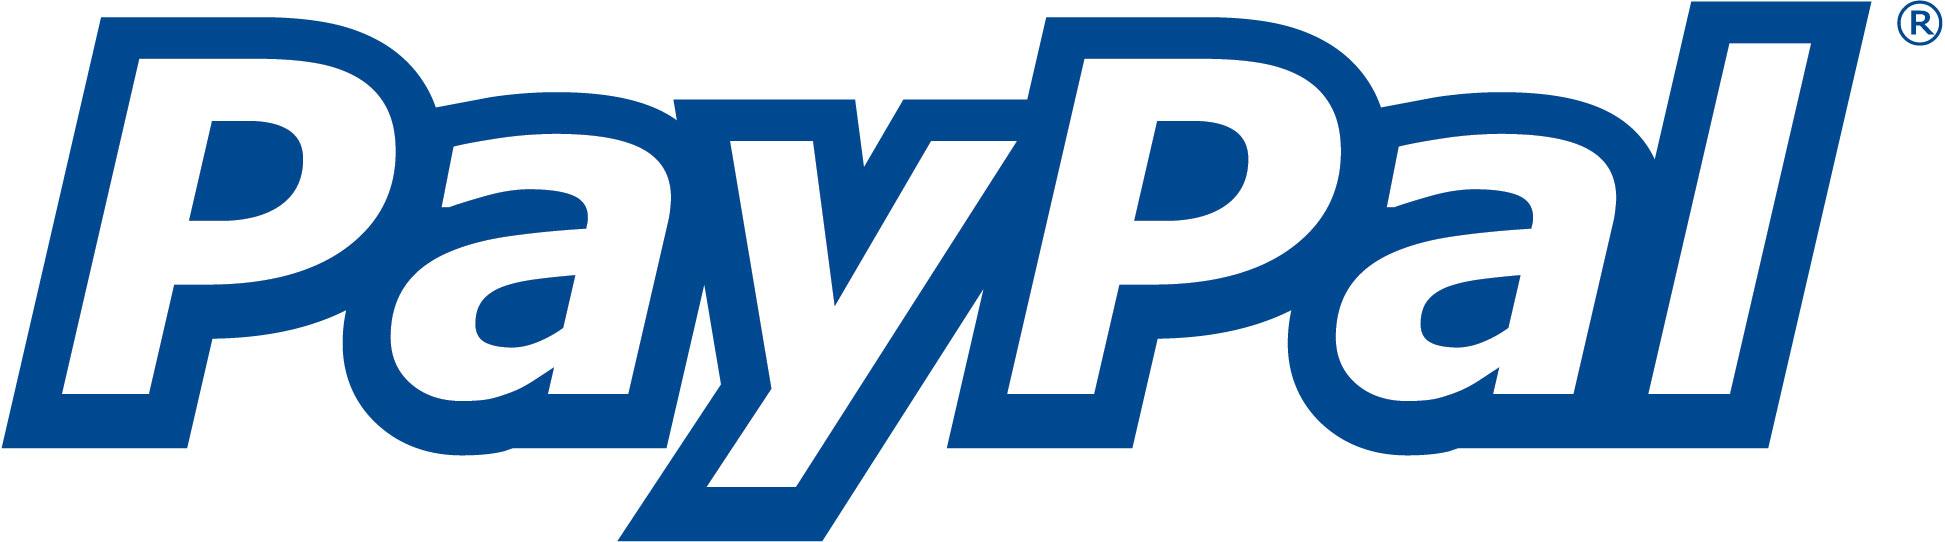 paypal-logo-271113